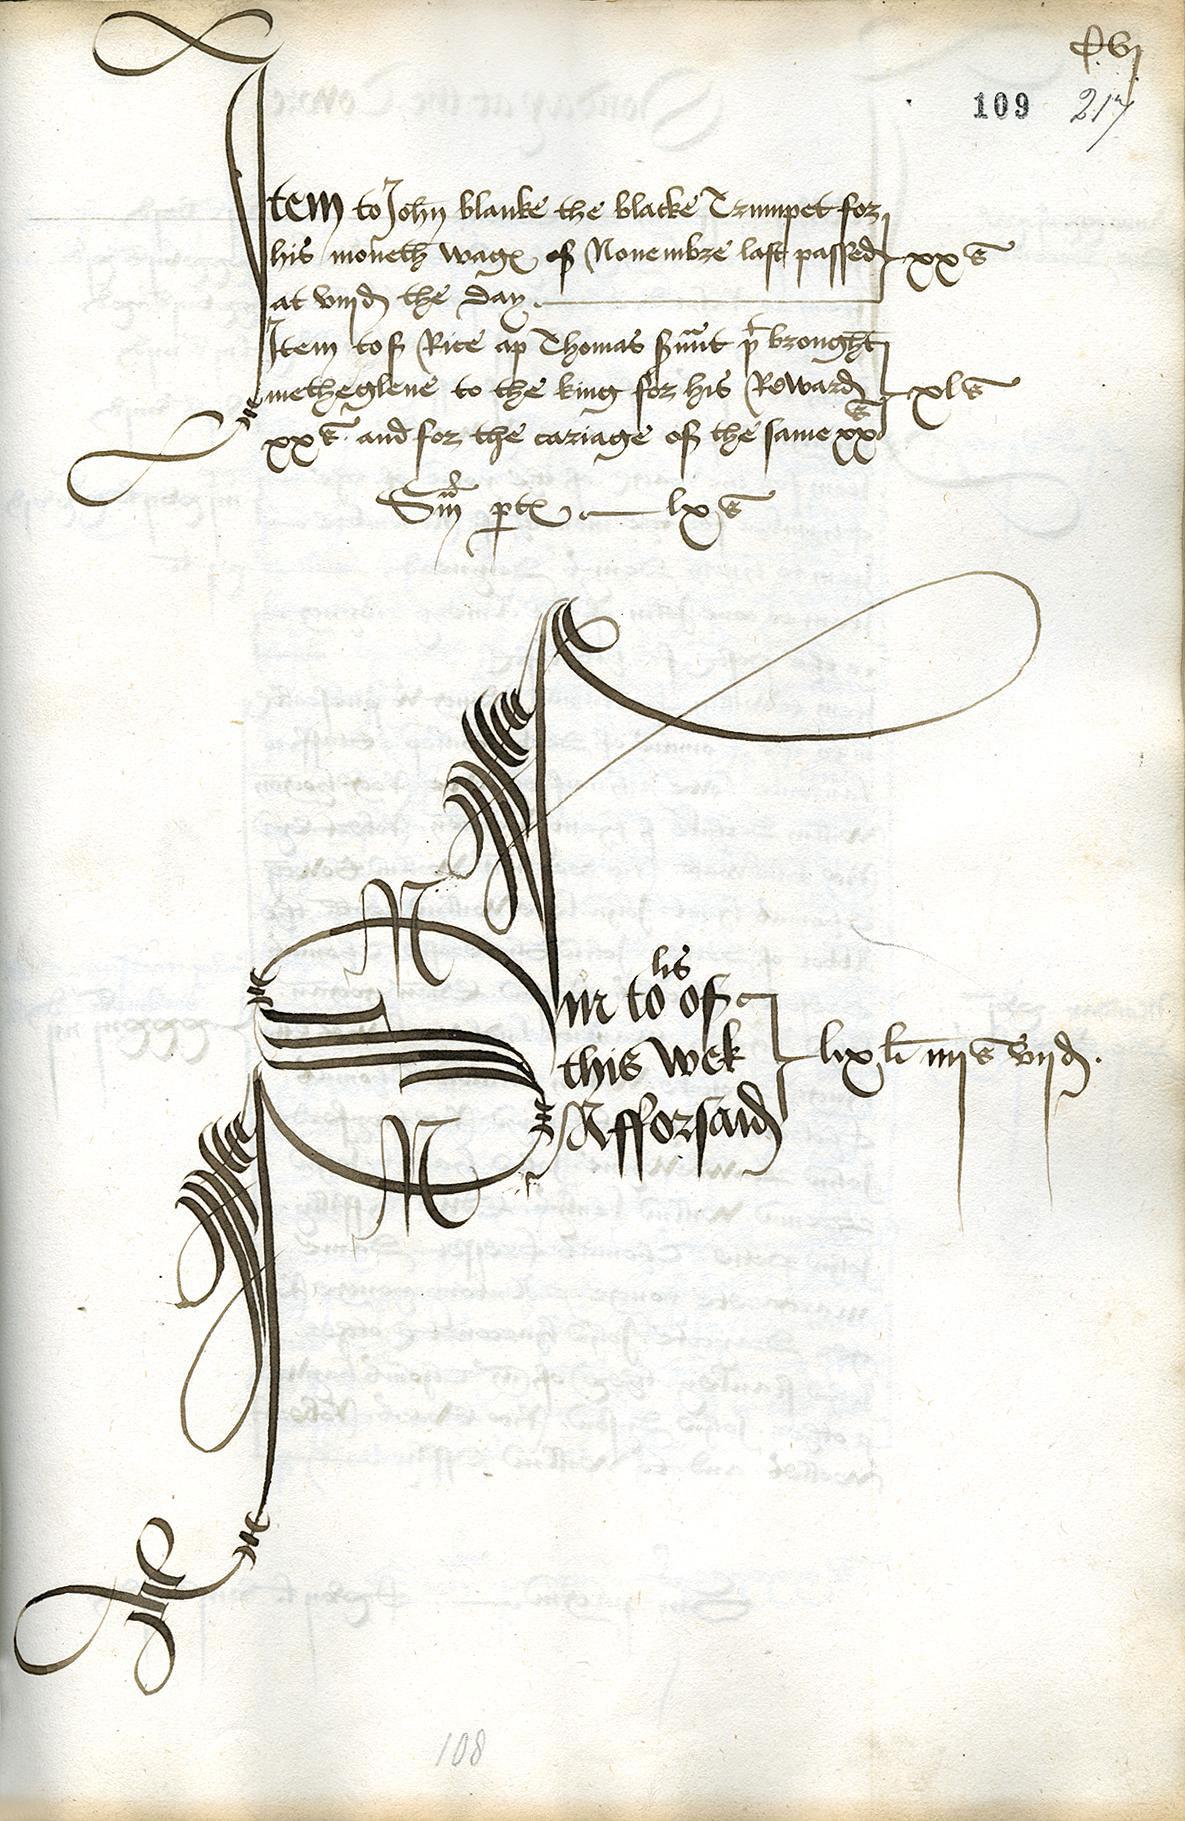 E36/214/109 7 December 1507